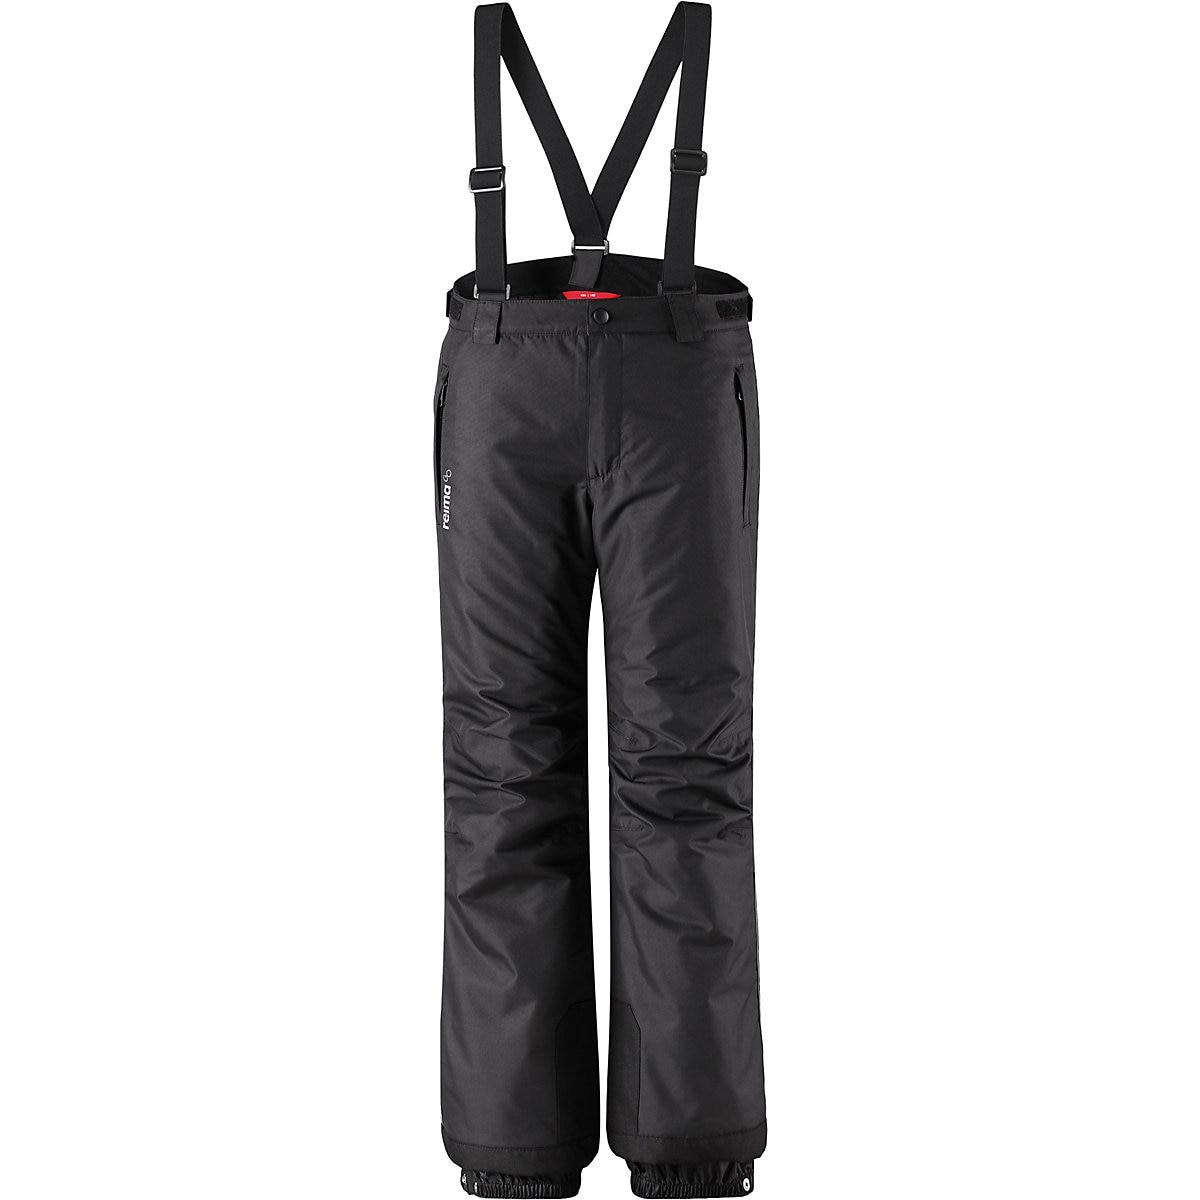 Pants & Capris Reima 8689261 for boys and girls polyester autumn winter bomhcs cute women autumn winter 100